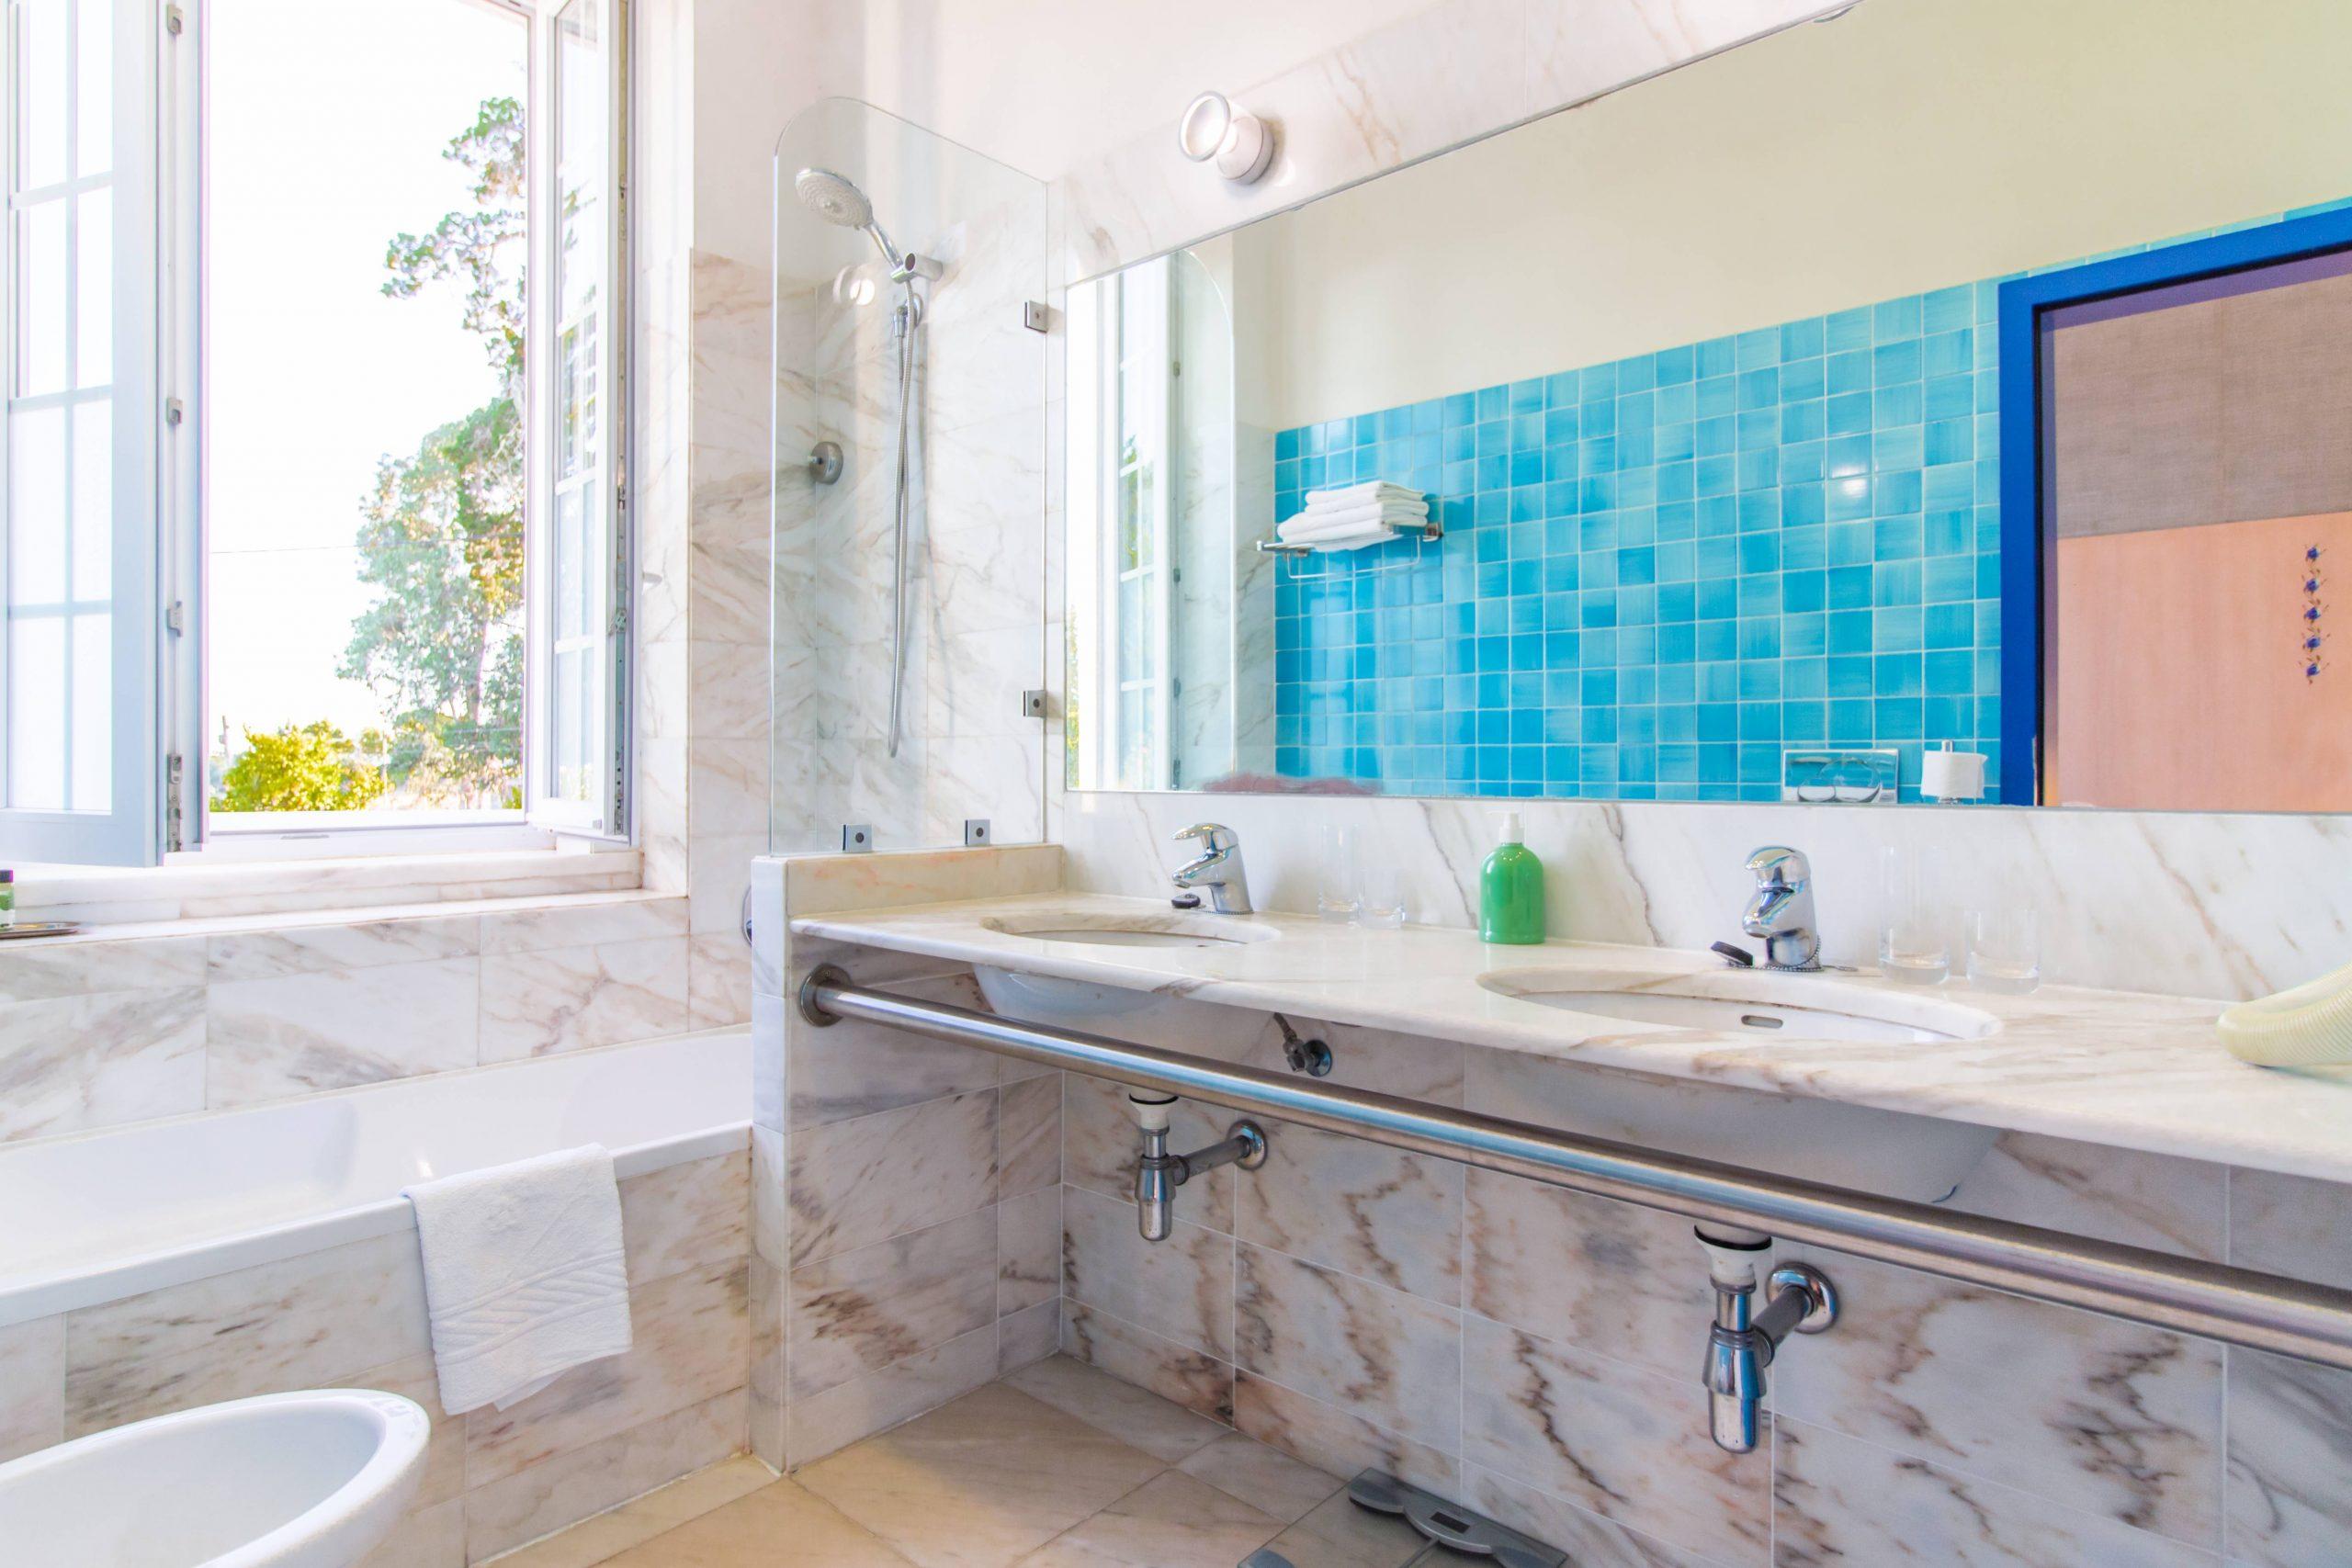 Hotel Lousal quarto twin wc